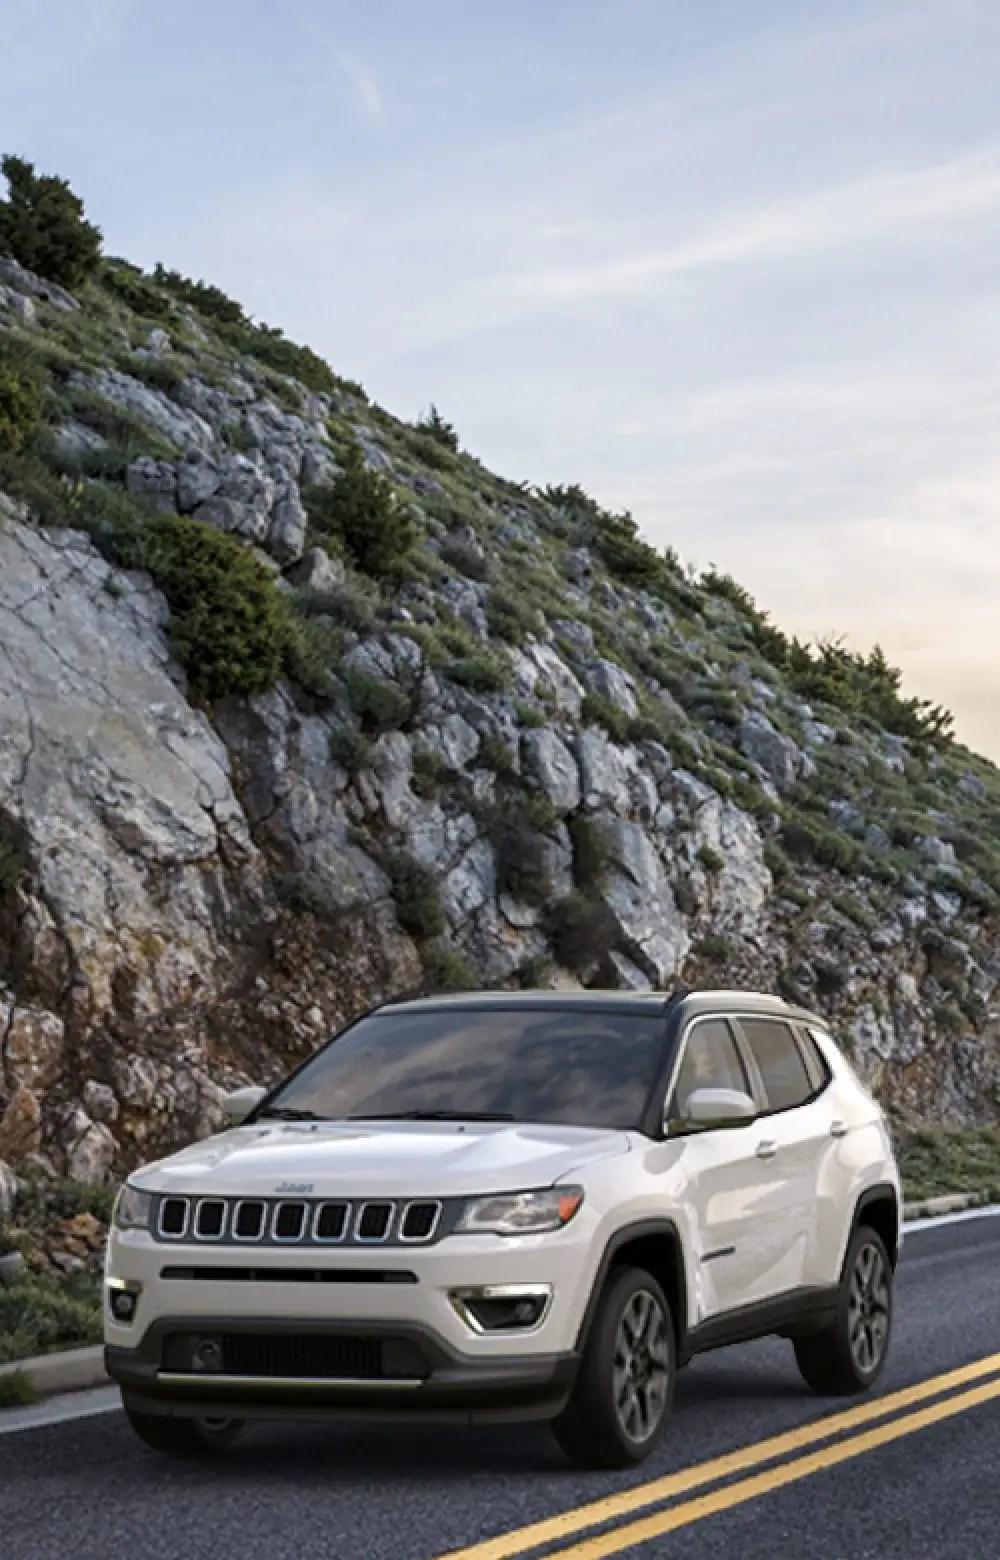 medium resolution of jeep compass hero mobile